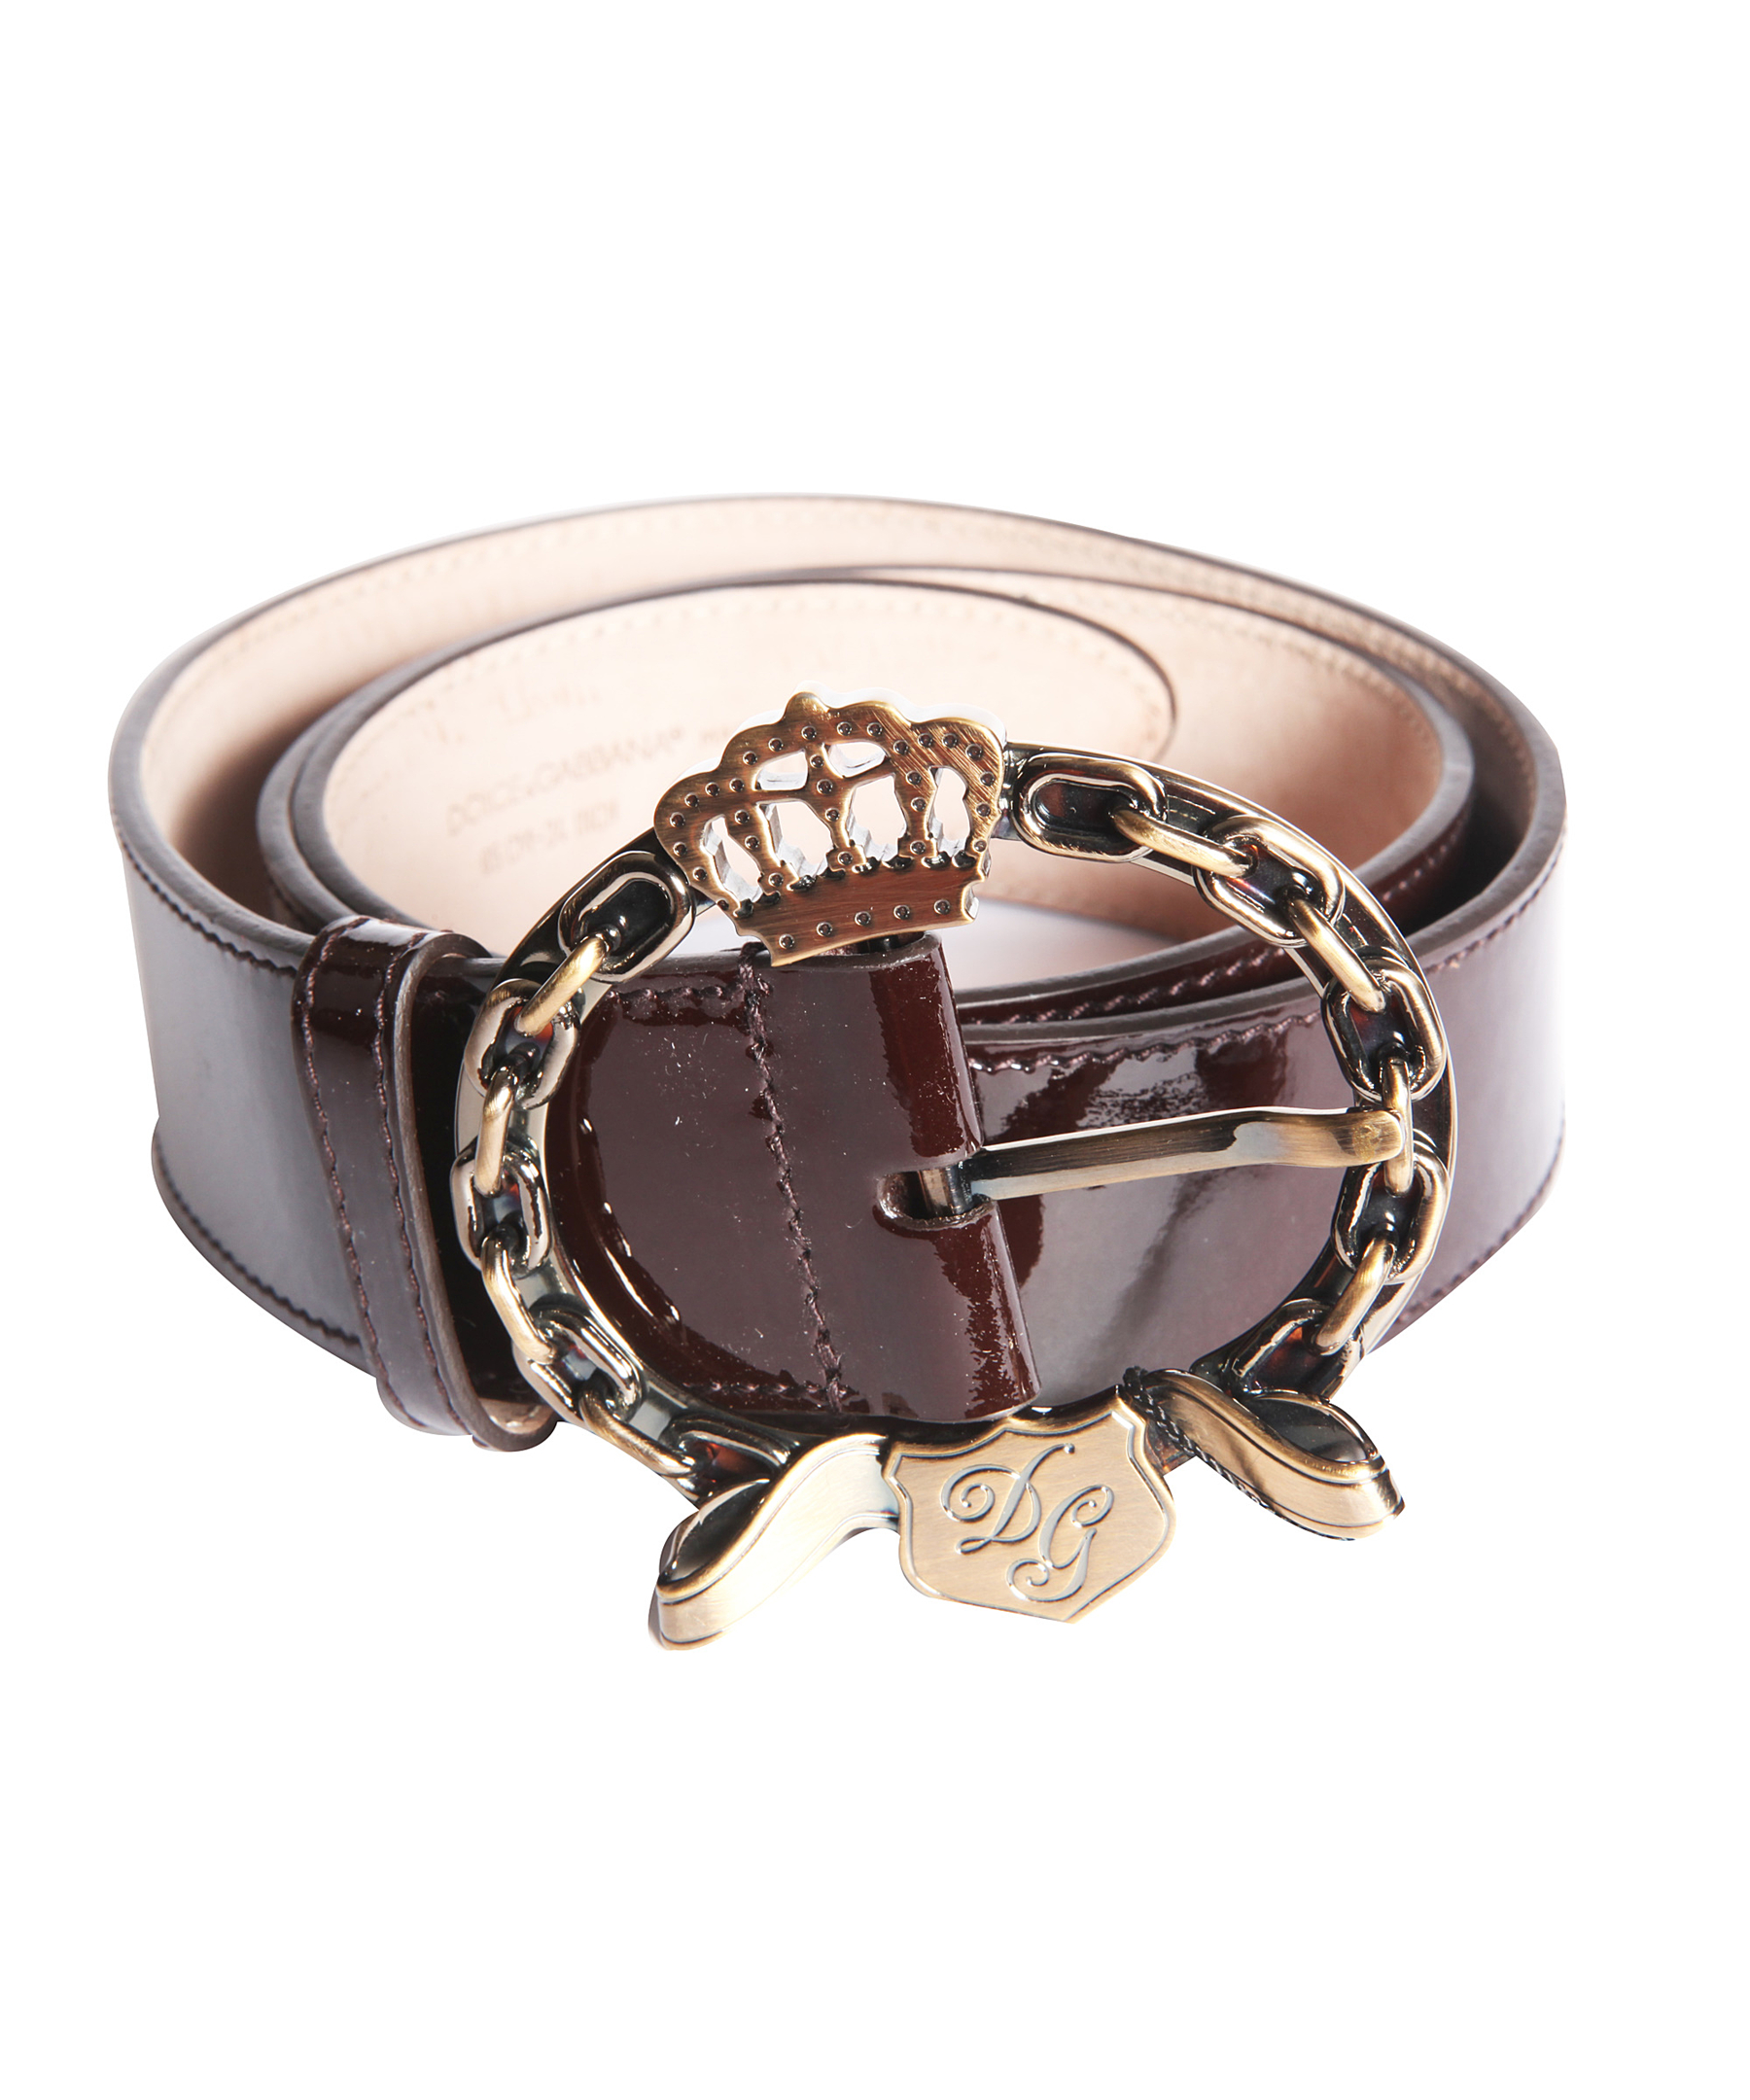 dolce gabbana s patent leather belt in black lyst